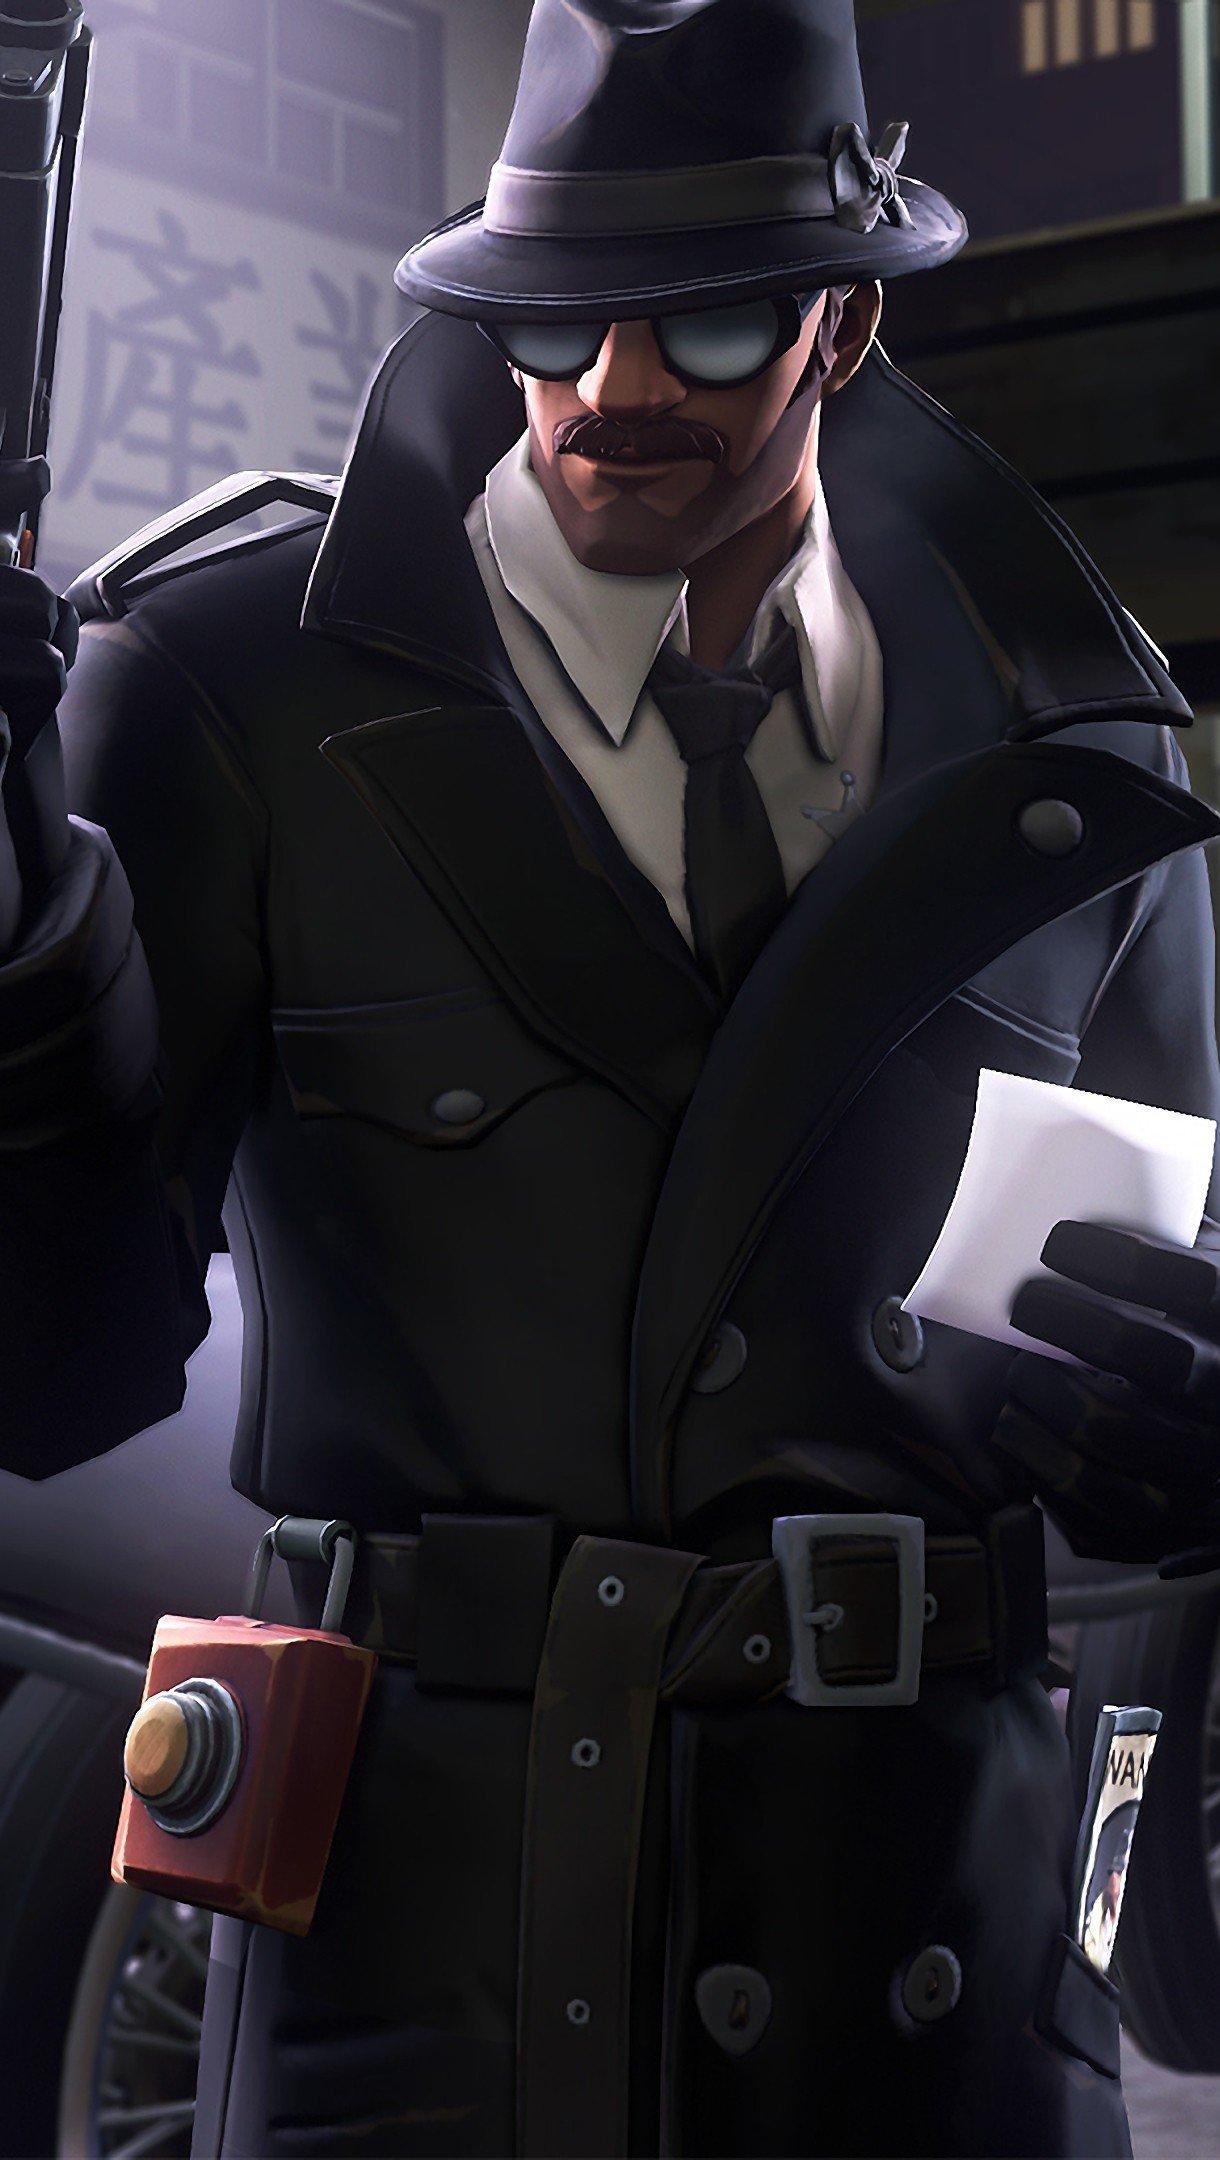 Fondos de pantalla Fortnite Detective Skins Vertical